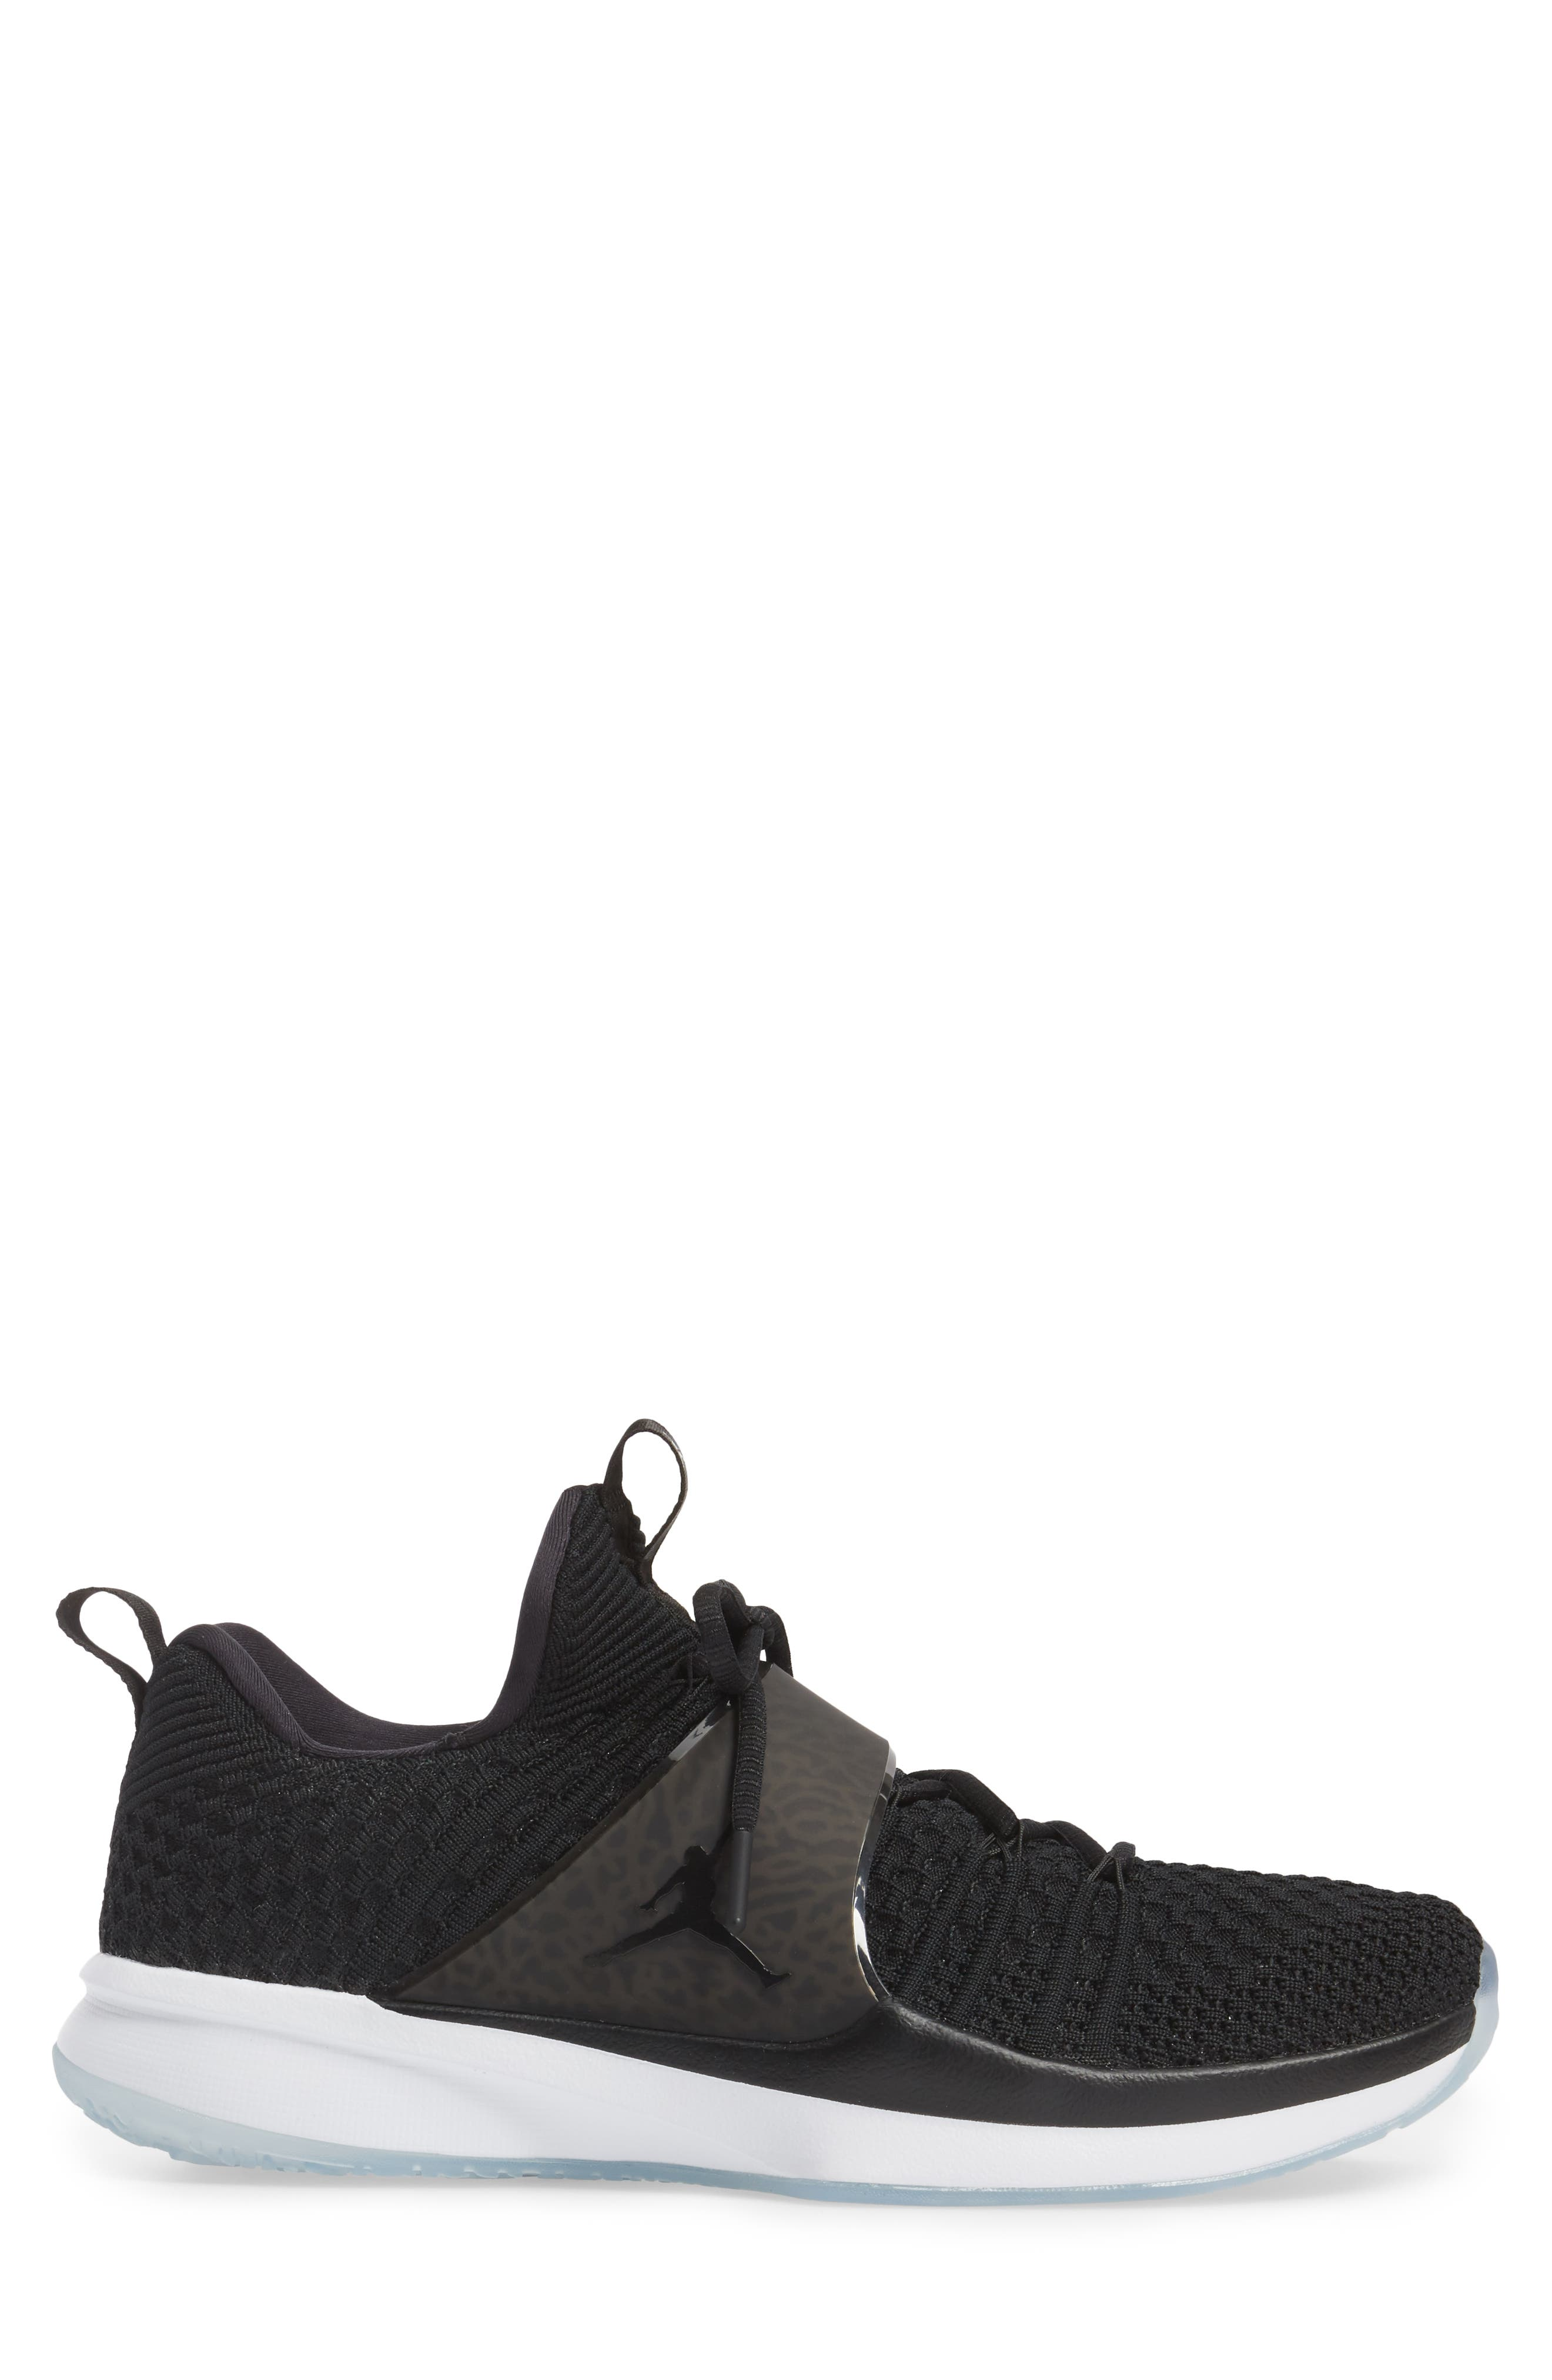 Jordan Flyknit Trainer 2 Low Sneaker,                             Alternate thumbnail 11, color,